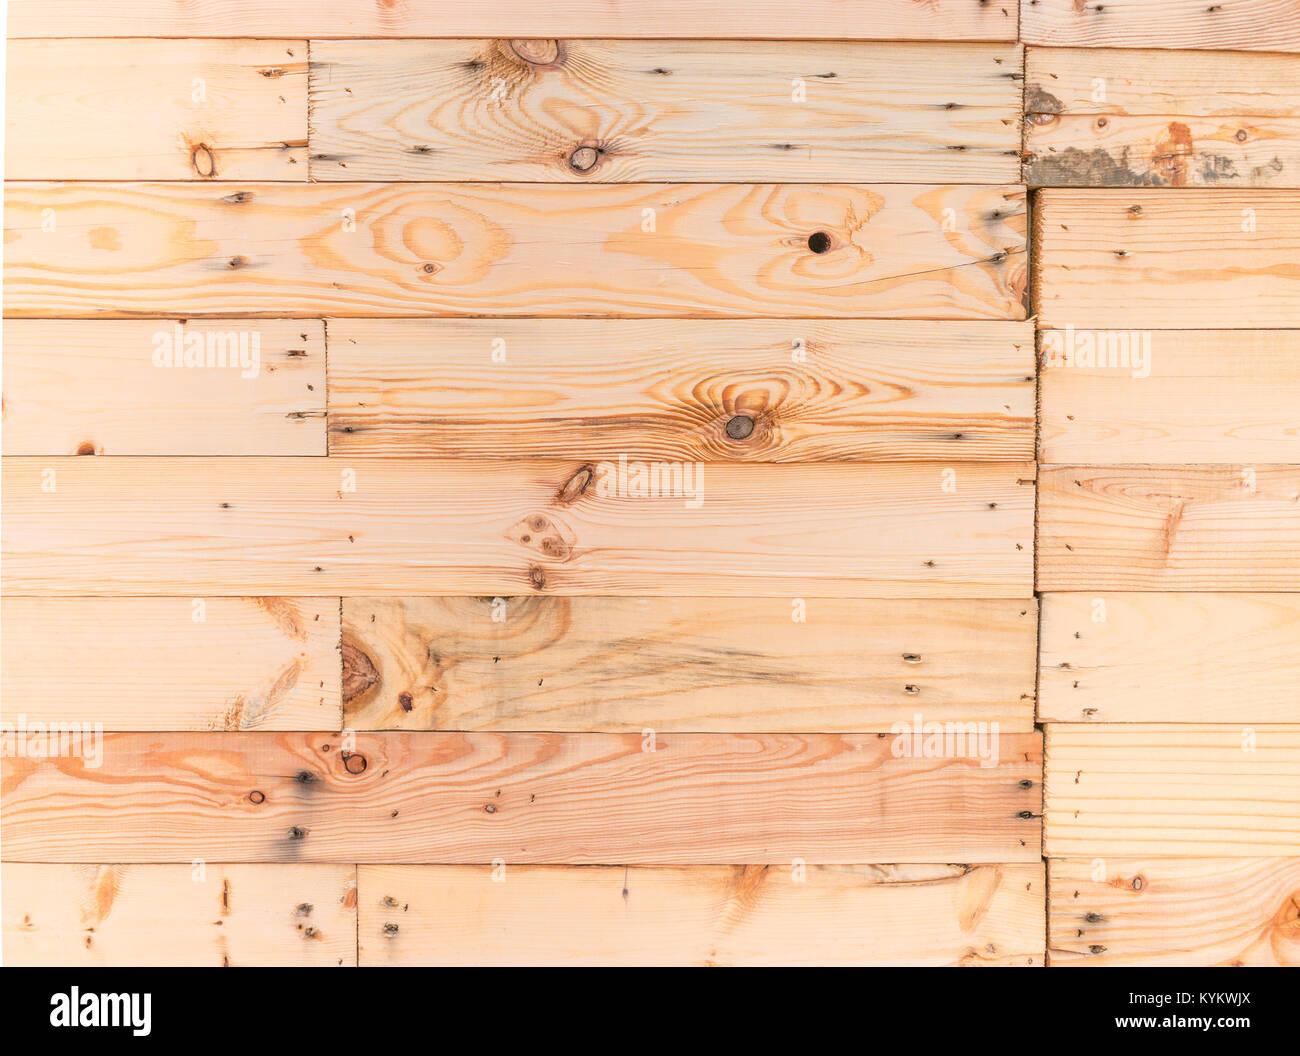 Old Rustic Beige Color Plank Wood Wall Texture Backgroundoutdoor House Backdrop